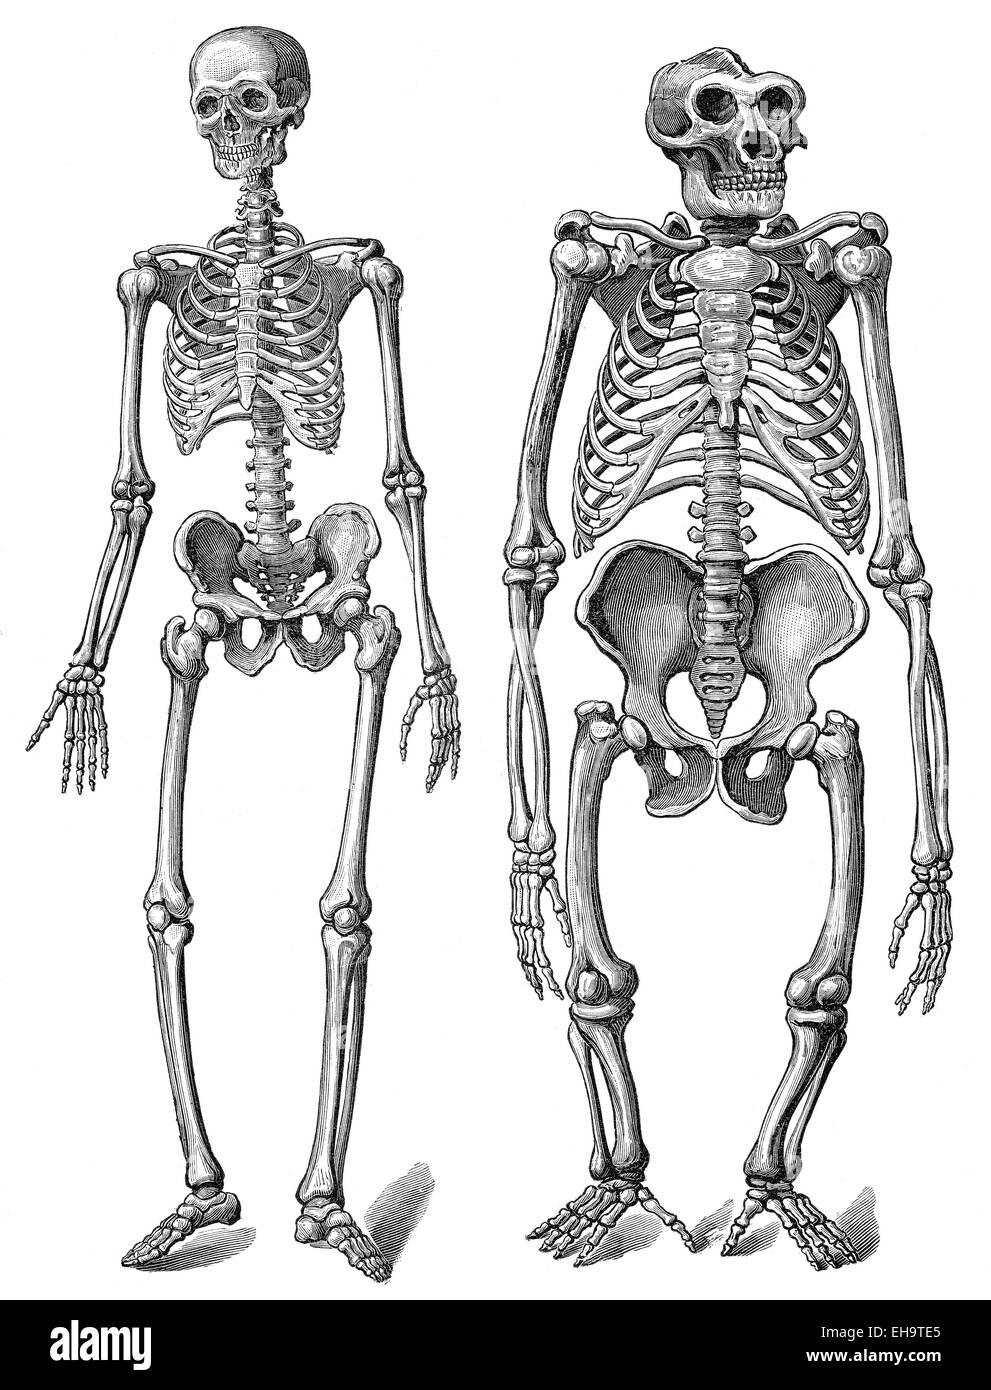 Representation Of The Skeleton Imágenes De Stock & Representation Of ...